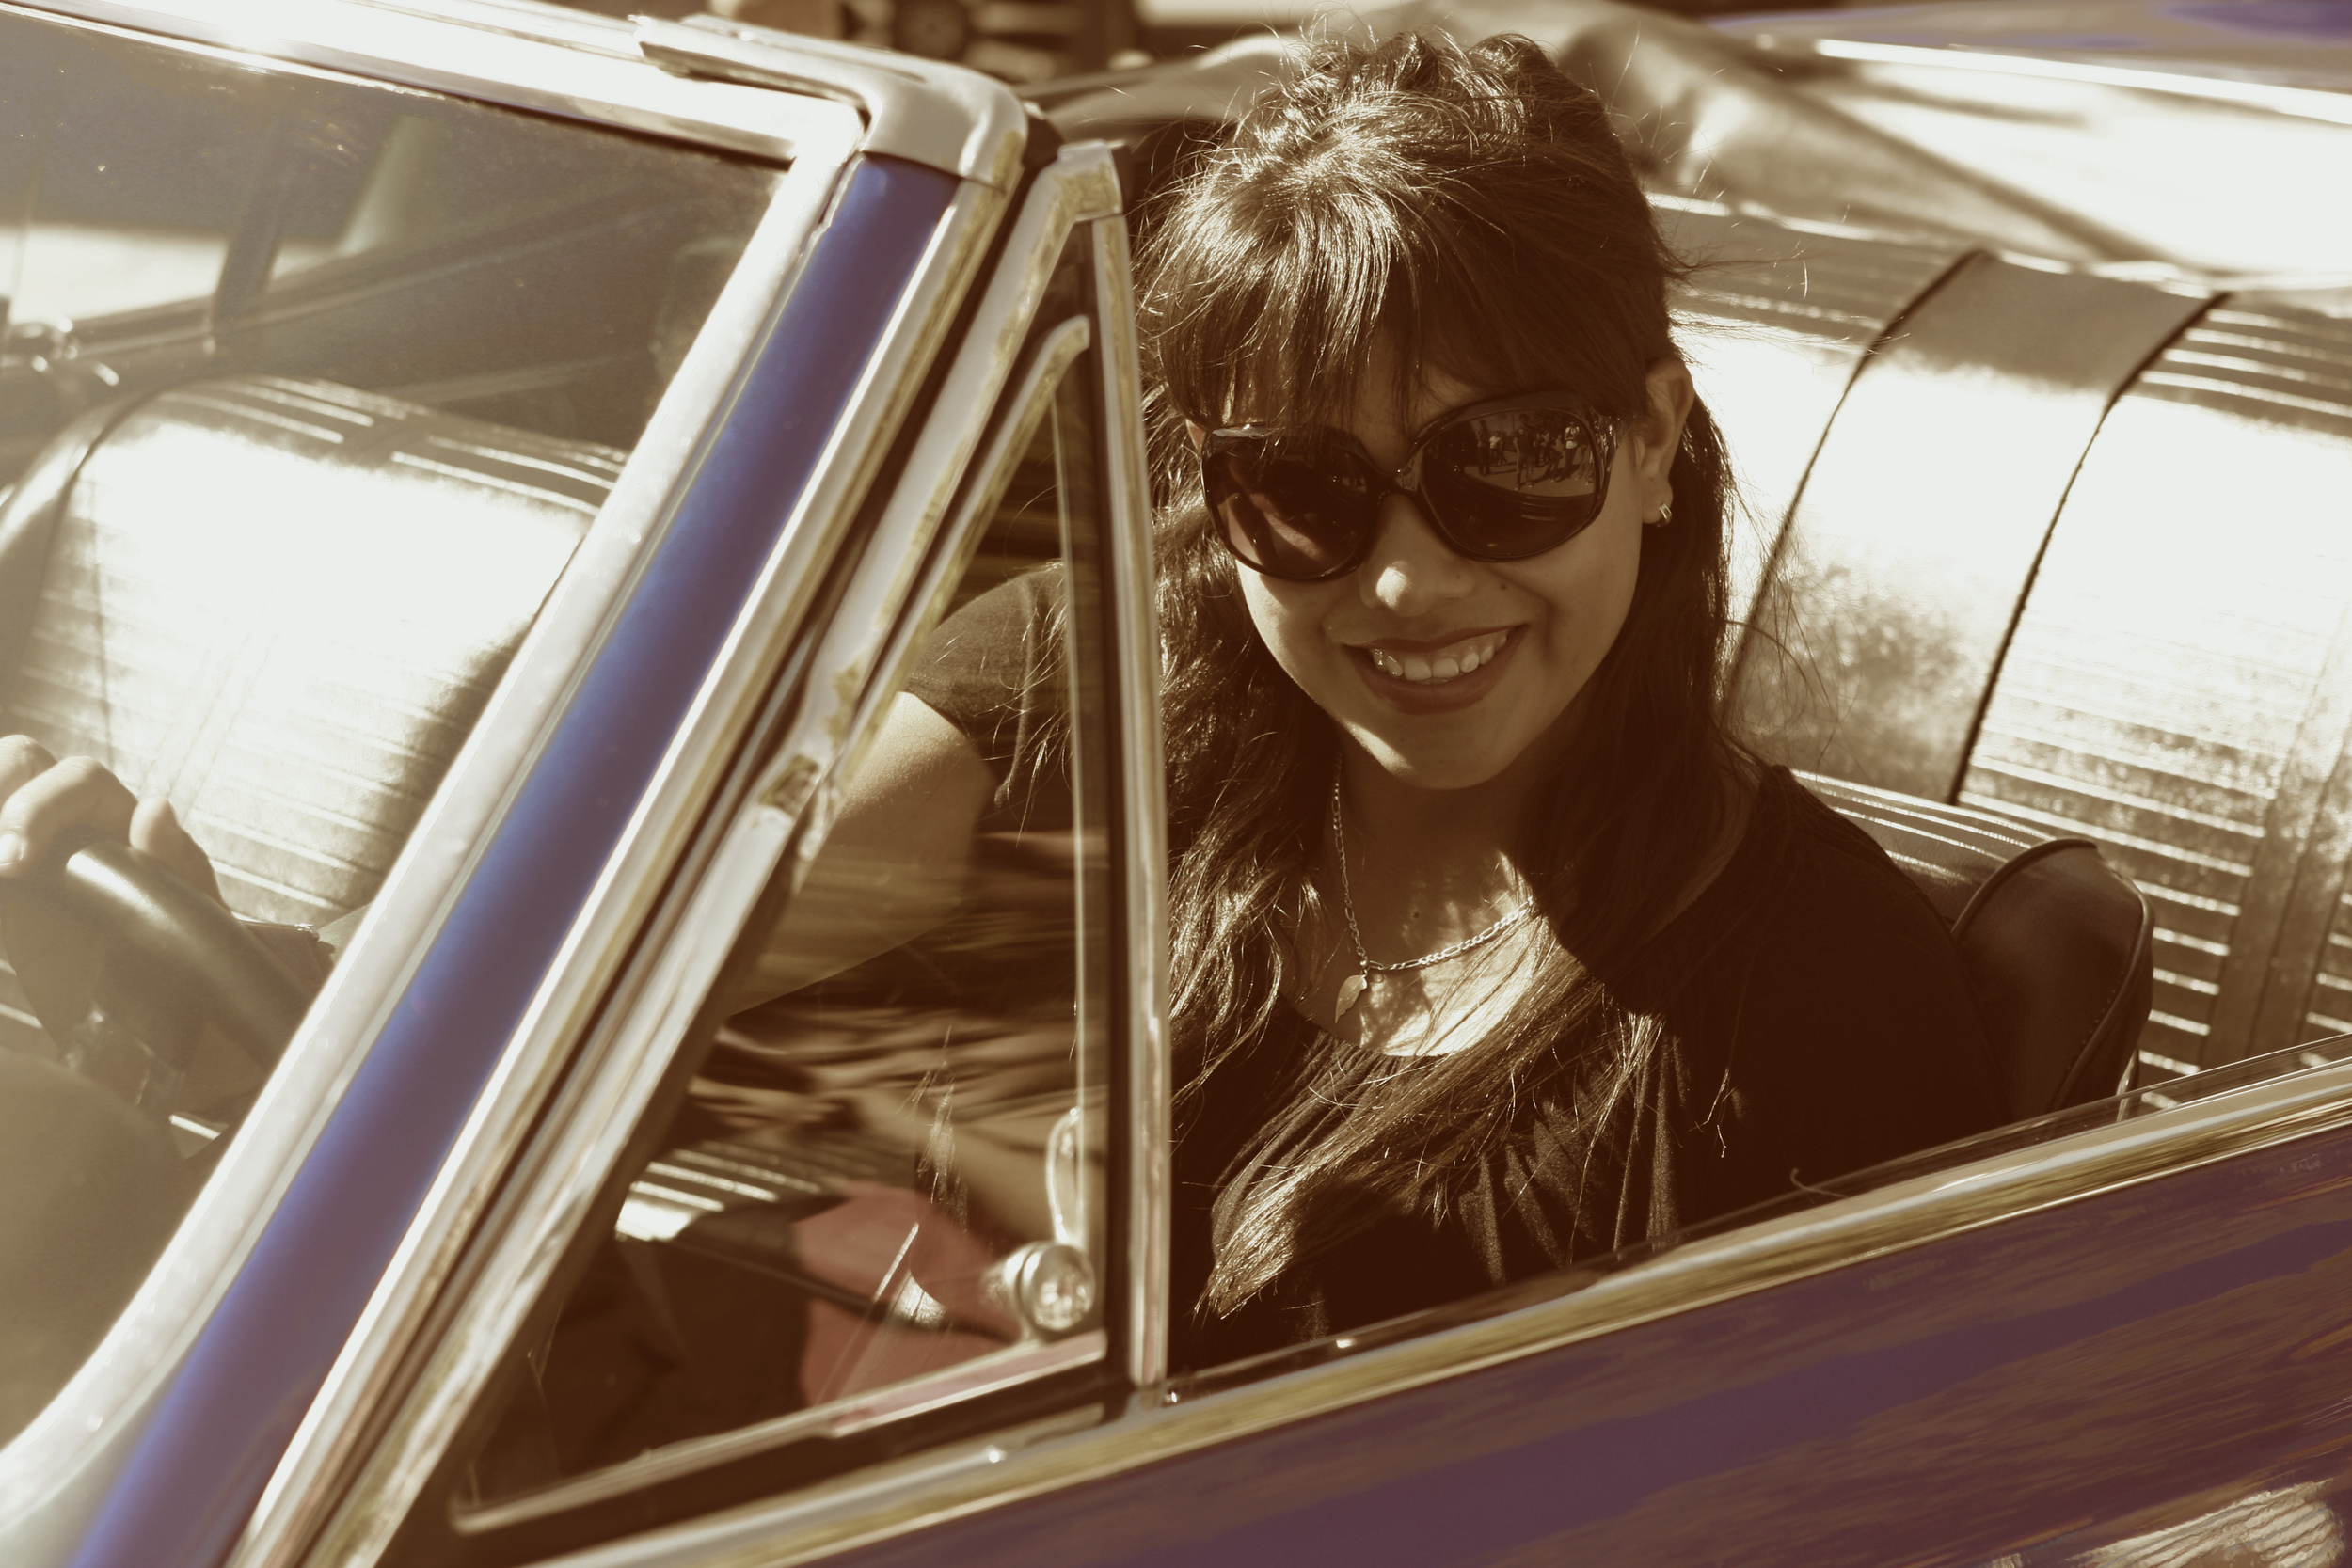 Driver's Seat – Alex, Flickr